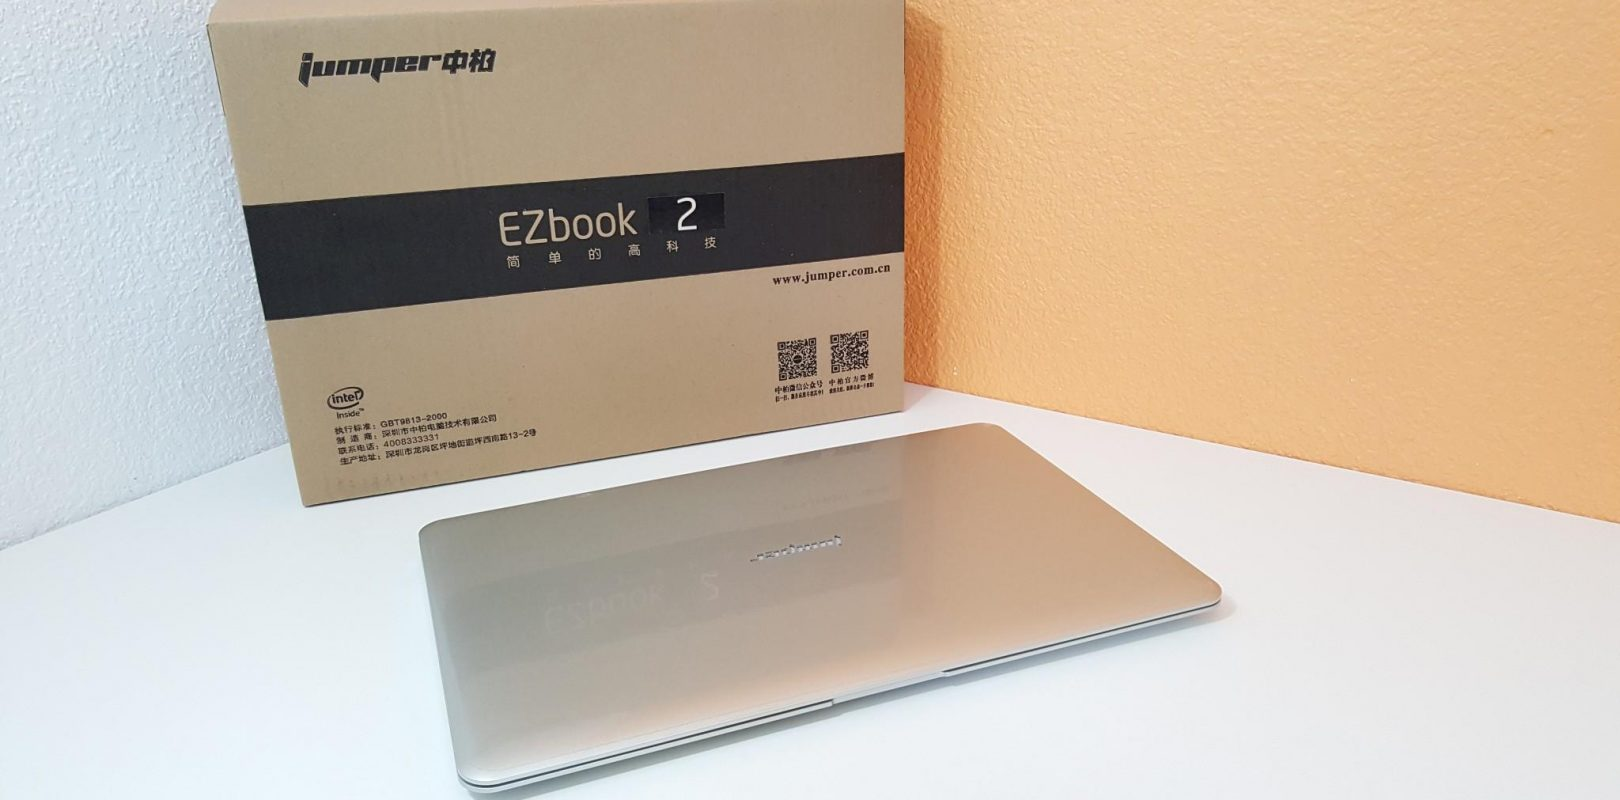 Jumper EZBook 2 Windows 10 Image - Restore EZBook 2 To Factory